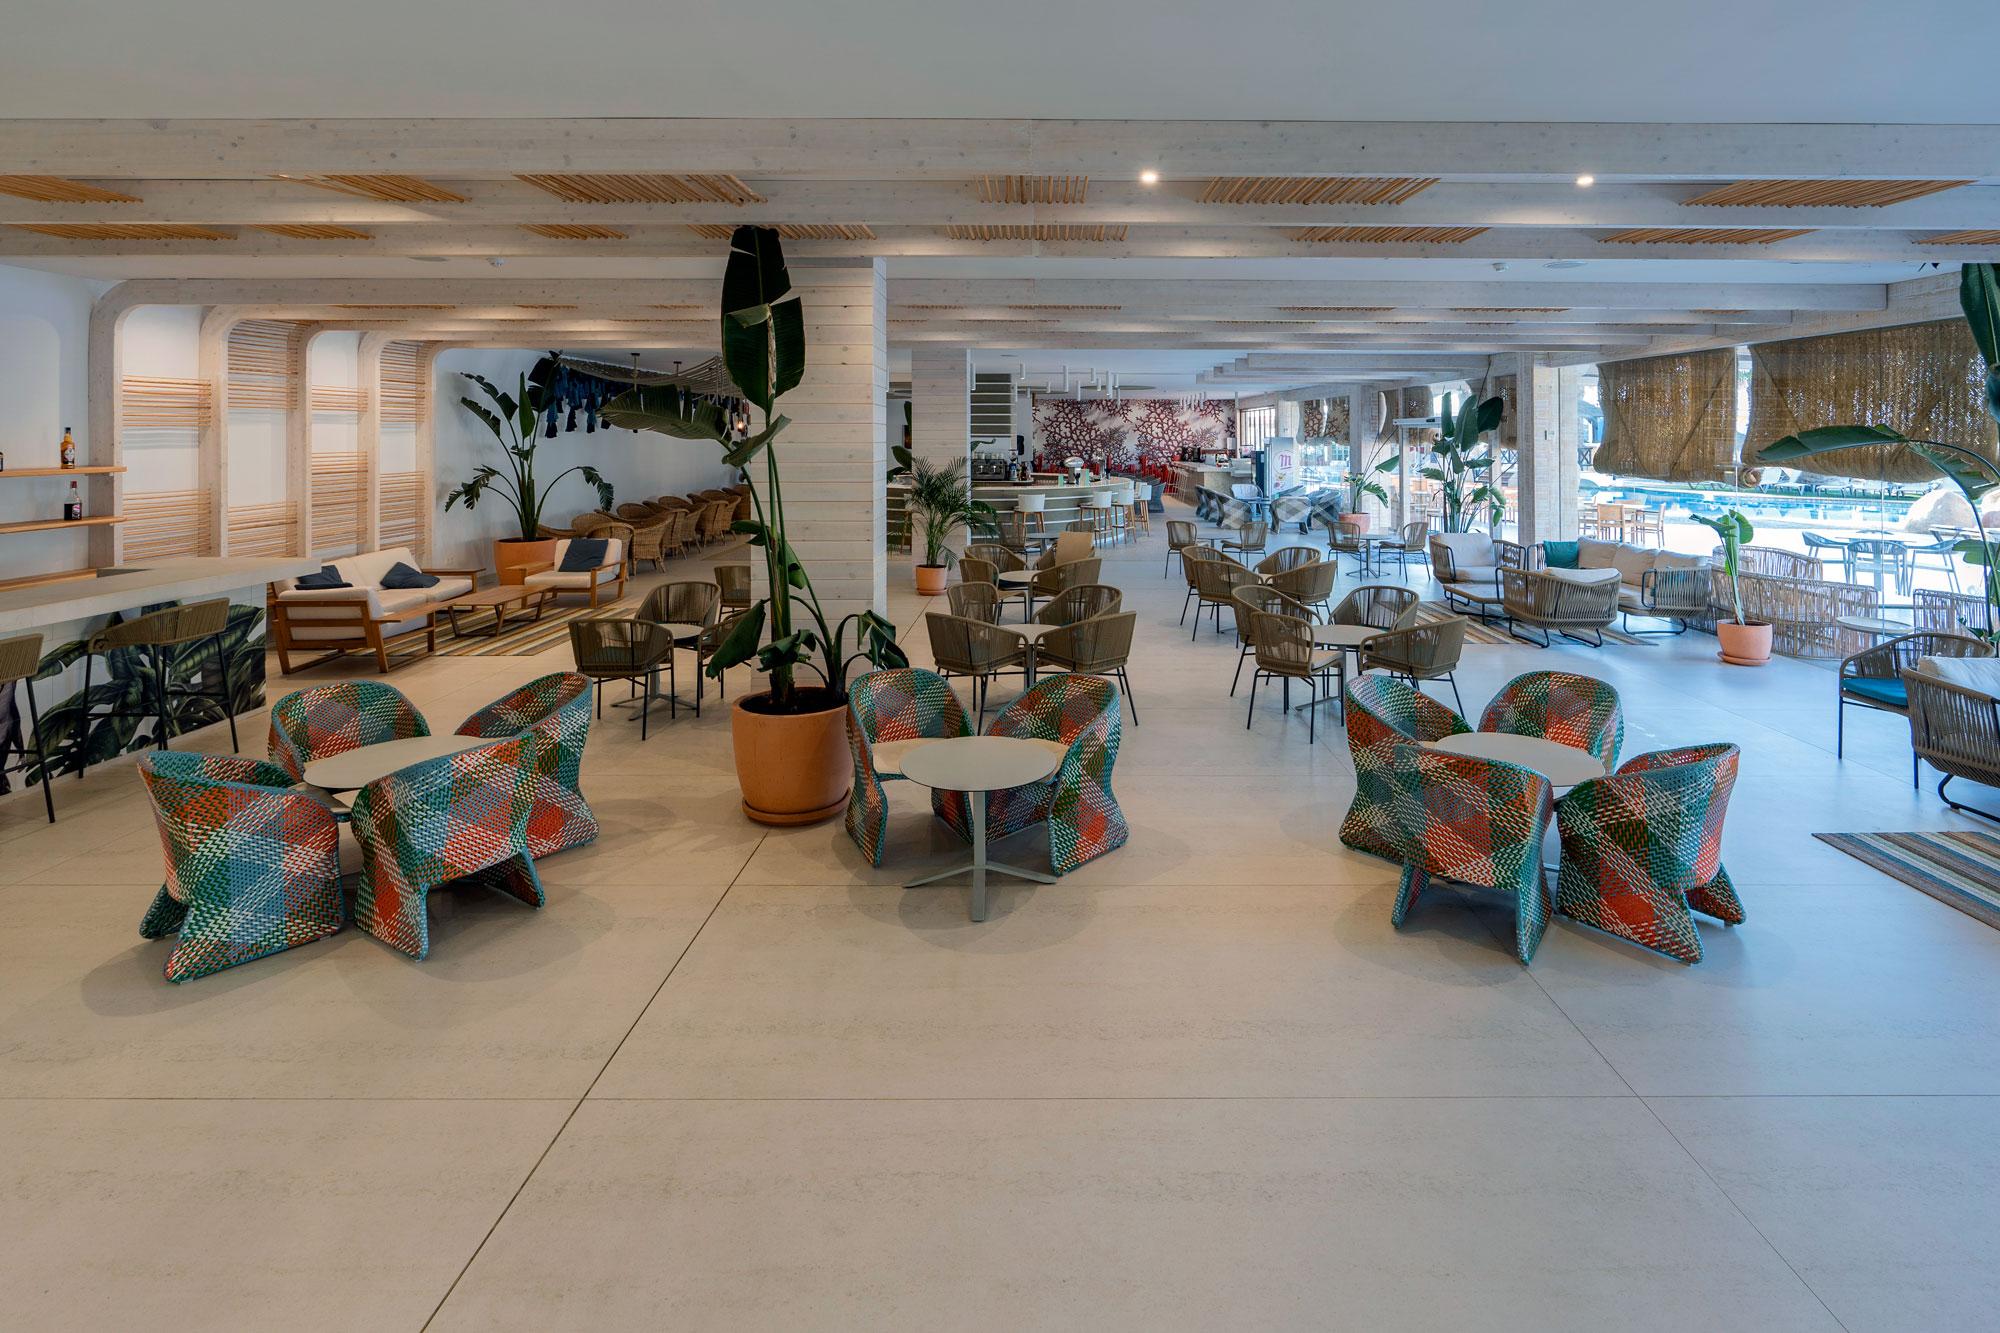 Hotel Mediterráneo  - Hotel Mediterraneo Park 8 Dekton Silestone Piedra Natural Cosentino 53